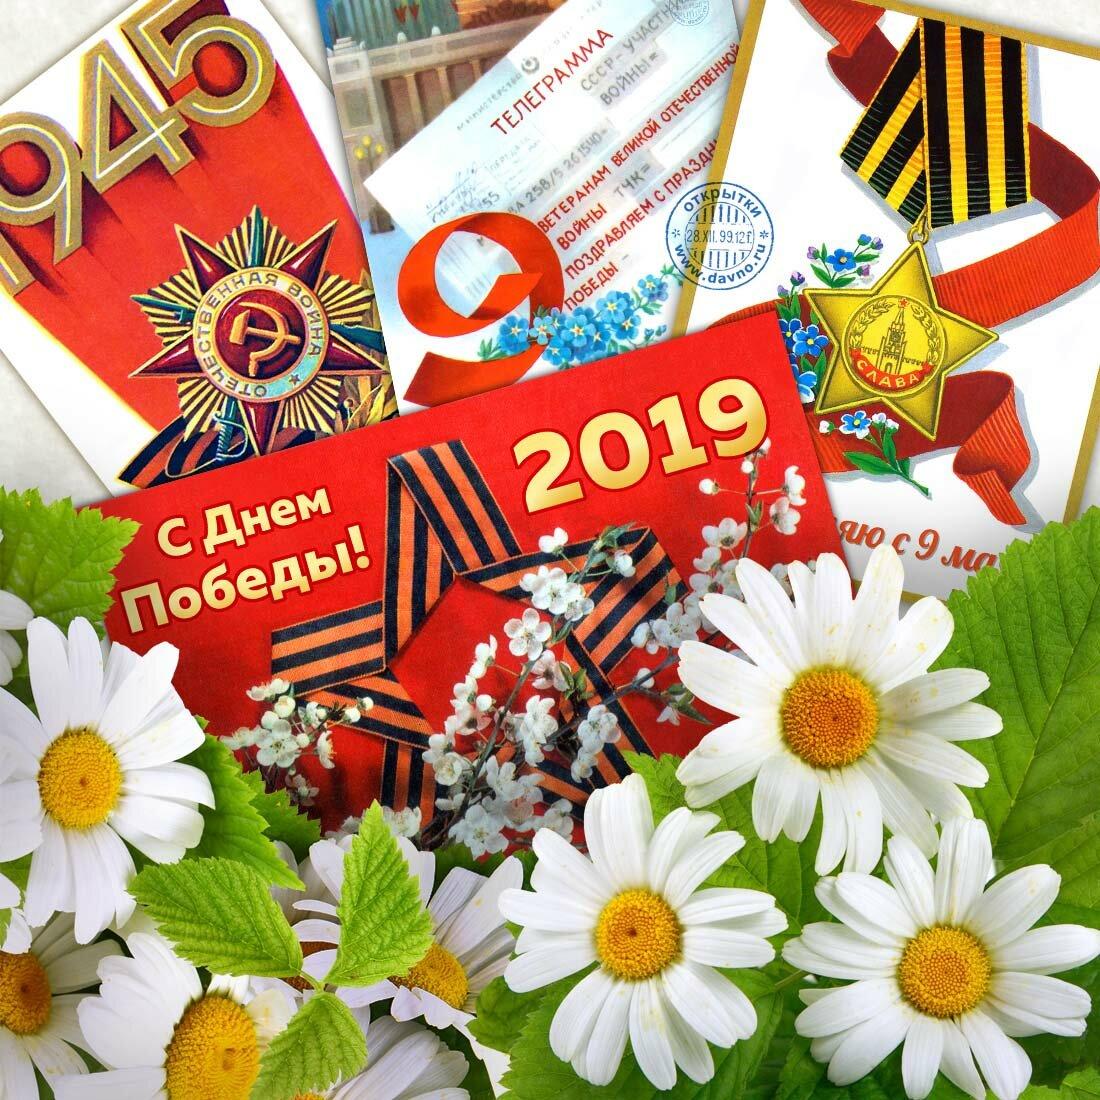 Яндекс картинки с 9 мая